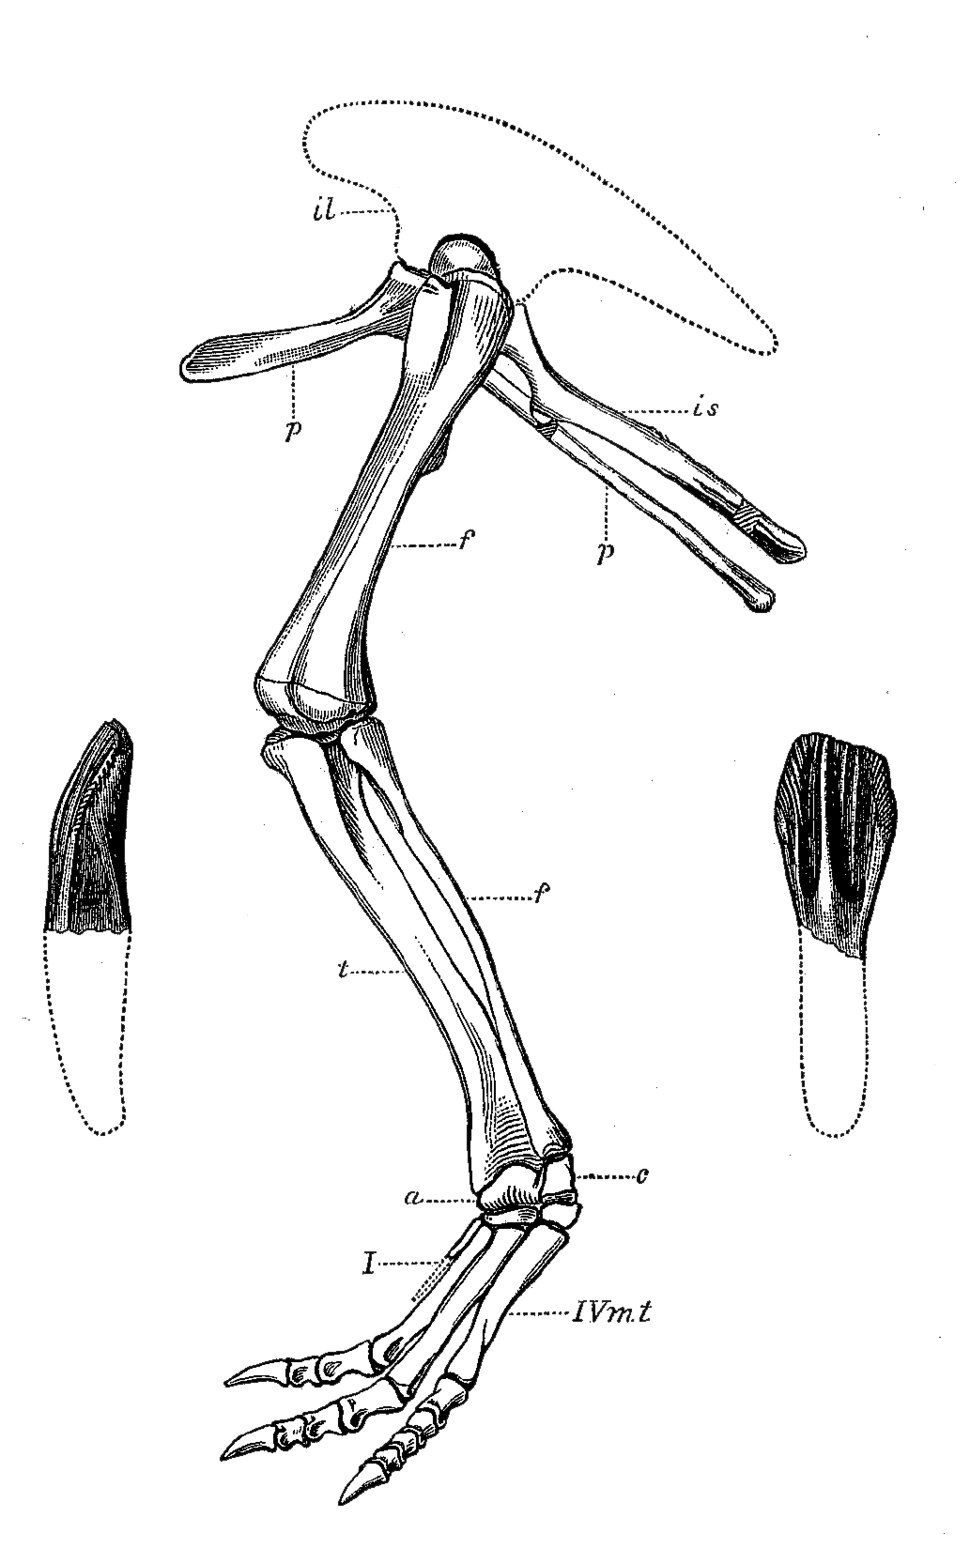 Dryosaurus limb